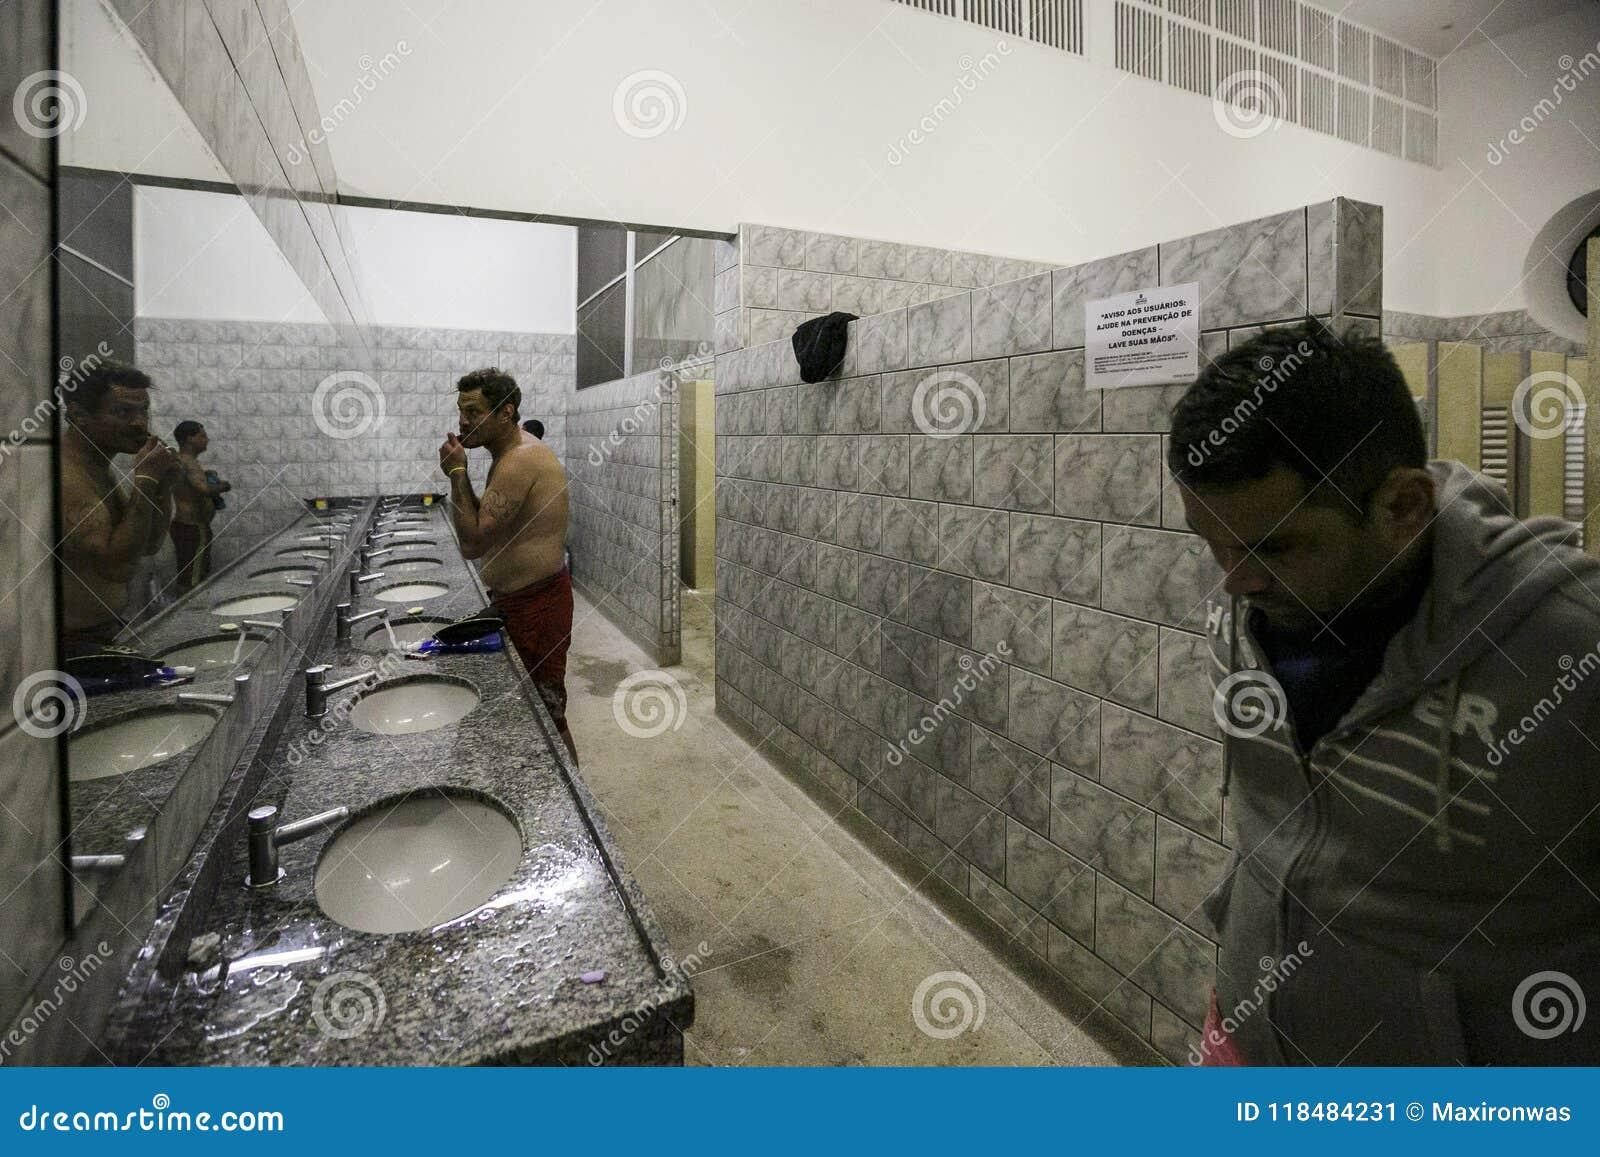 Brasil - San Paolo - The ONG Sermig - the dormitory bathrooms